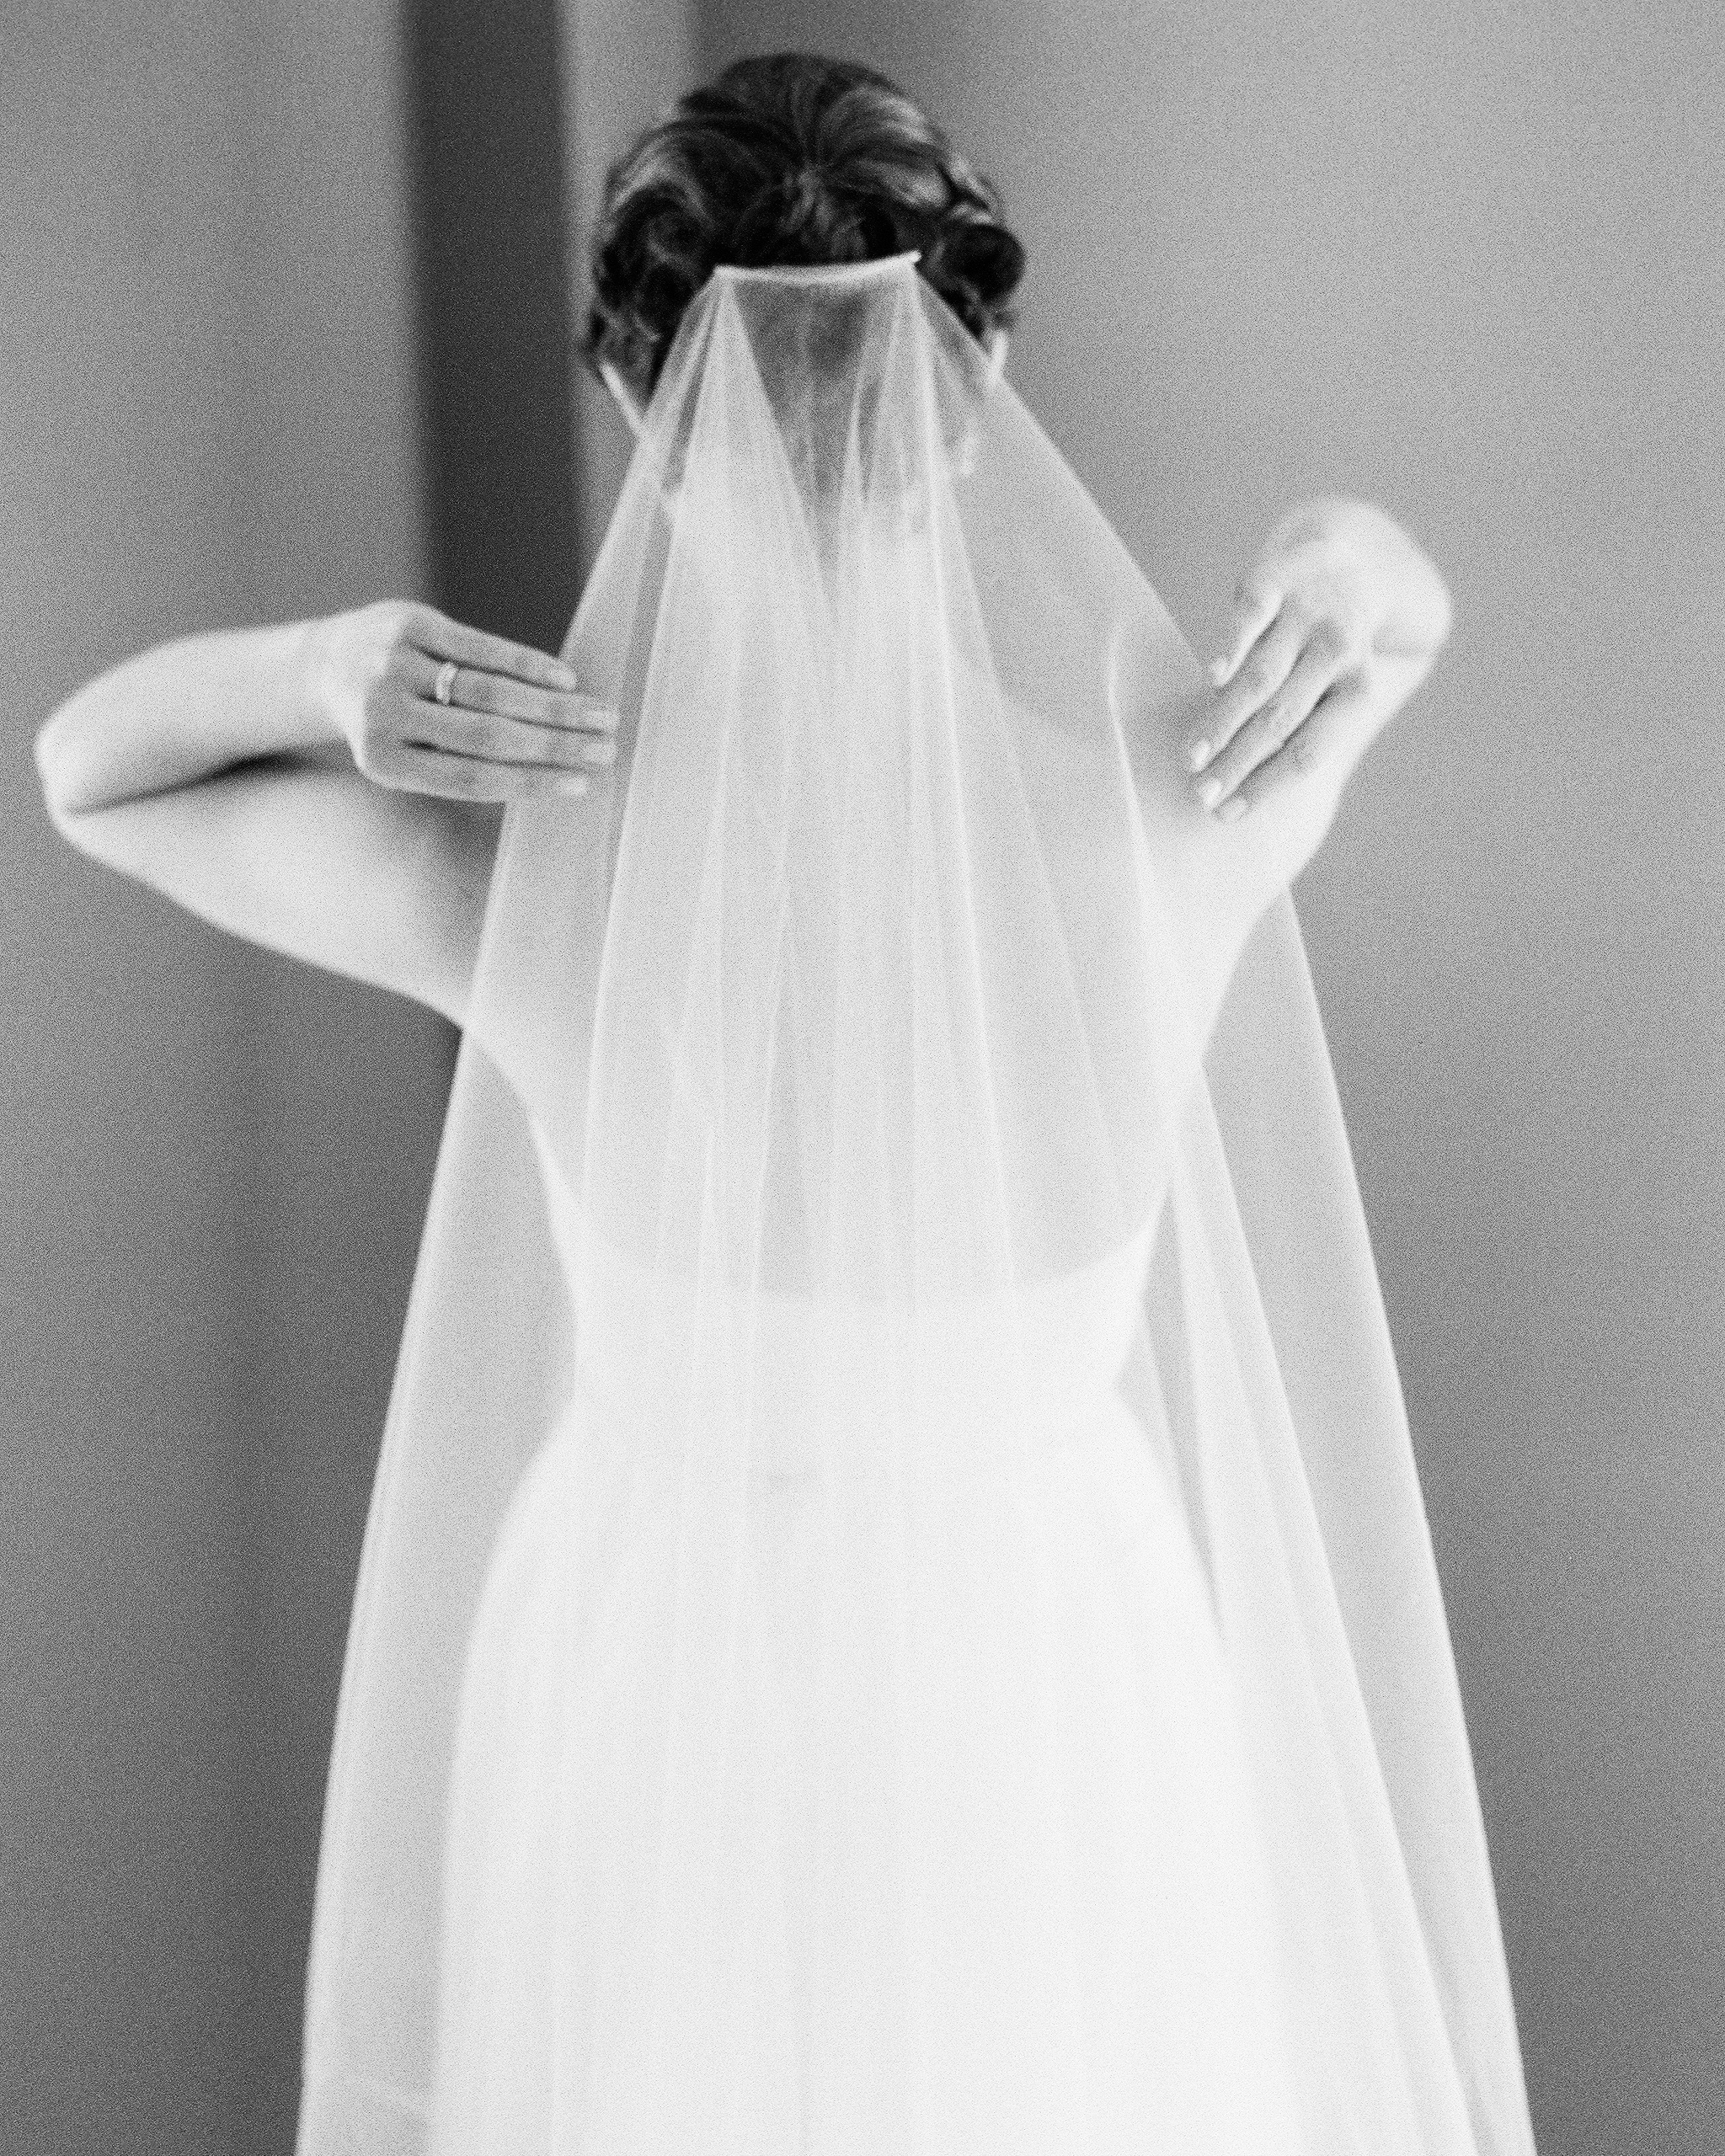 mackenzie-ian-wedding-veil-071-s112461-0116.jpg